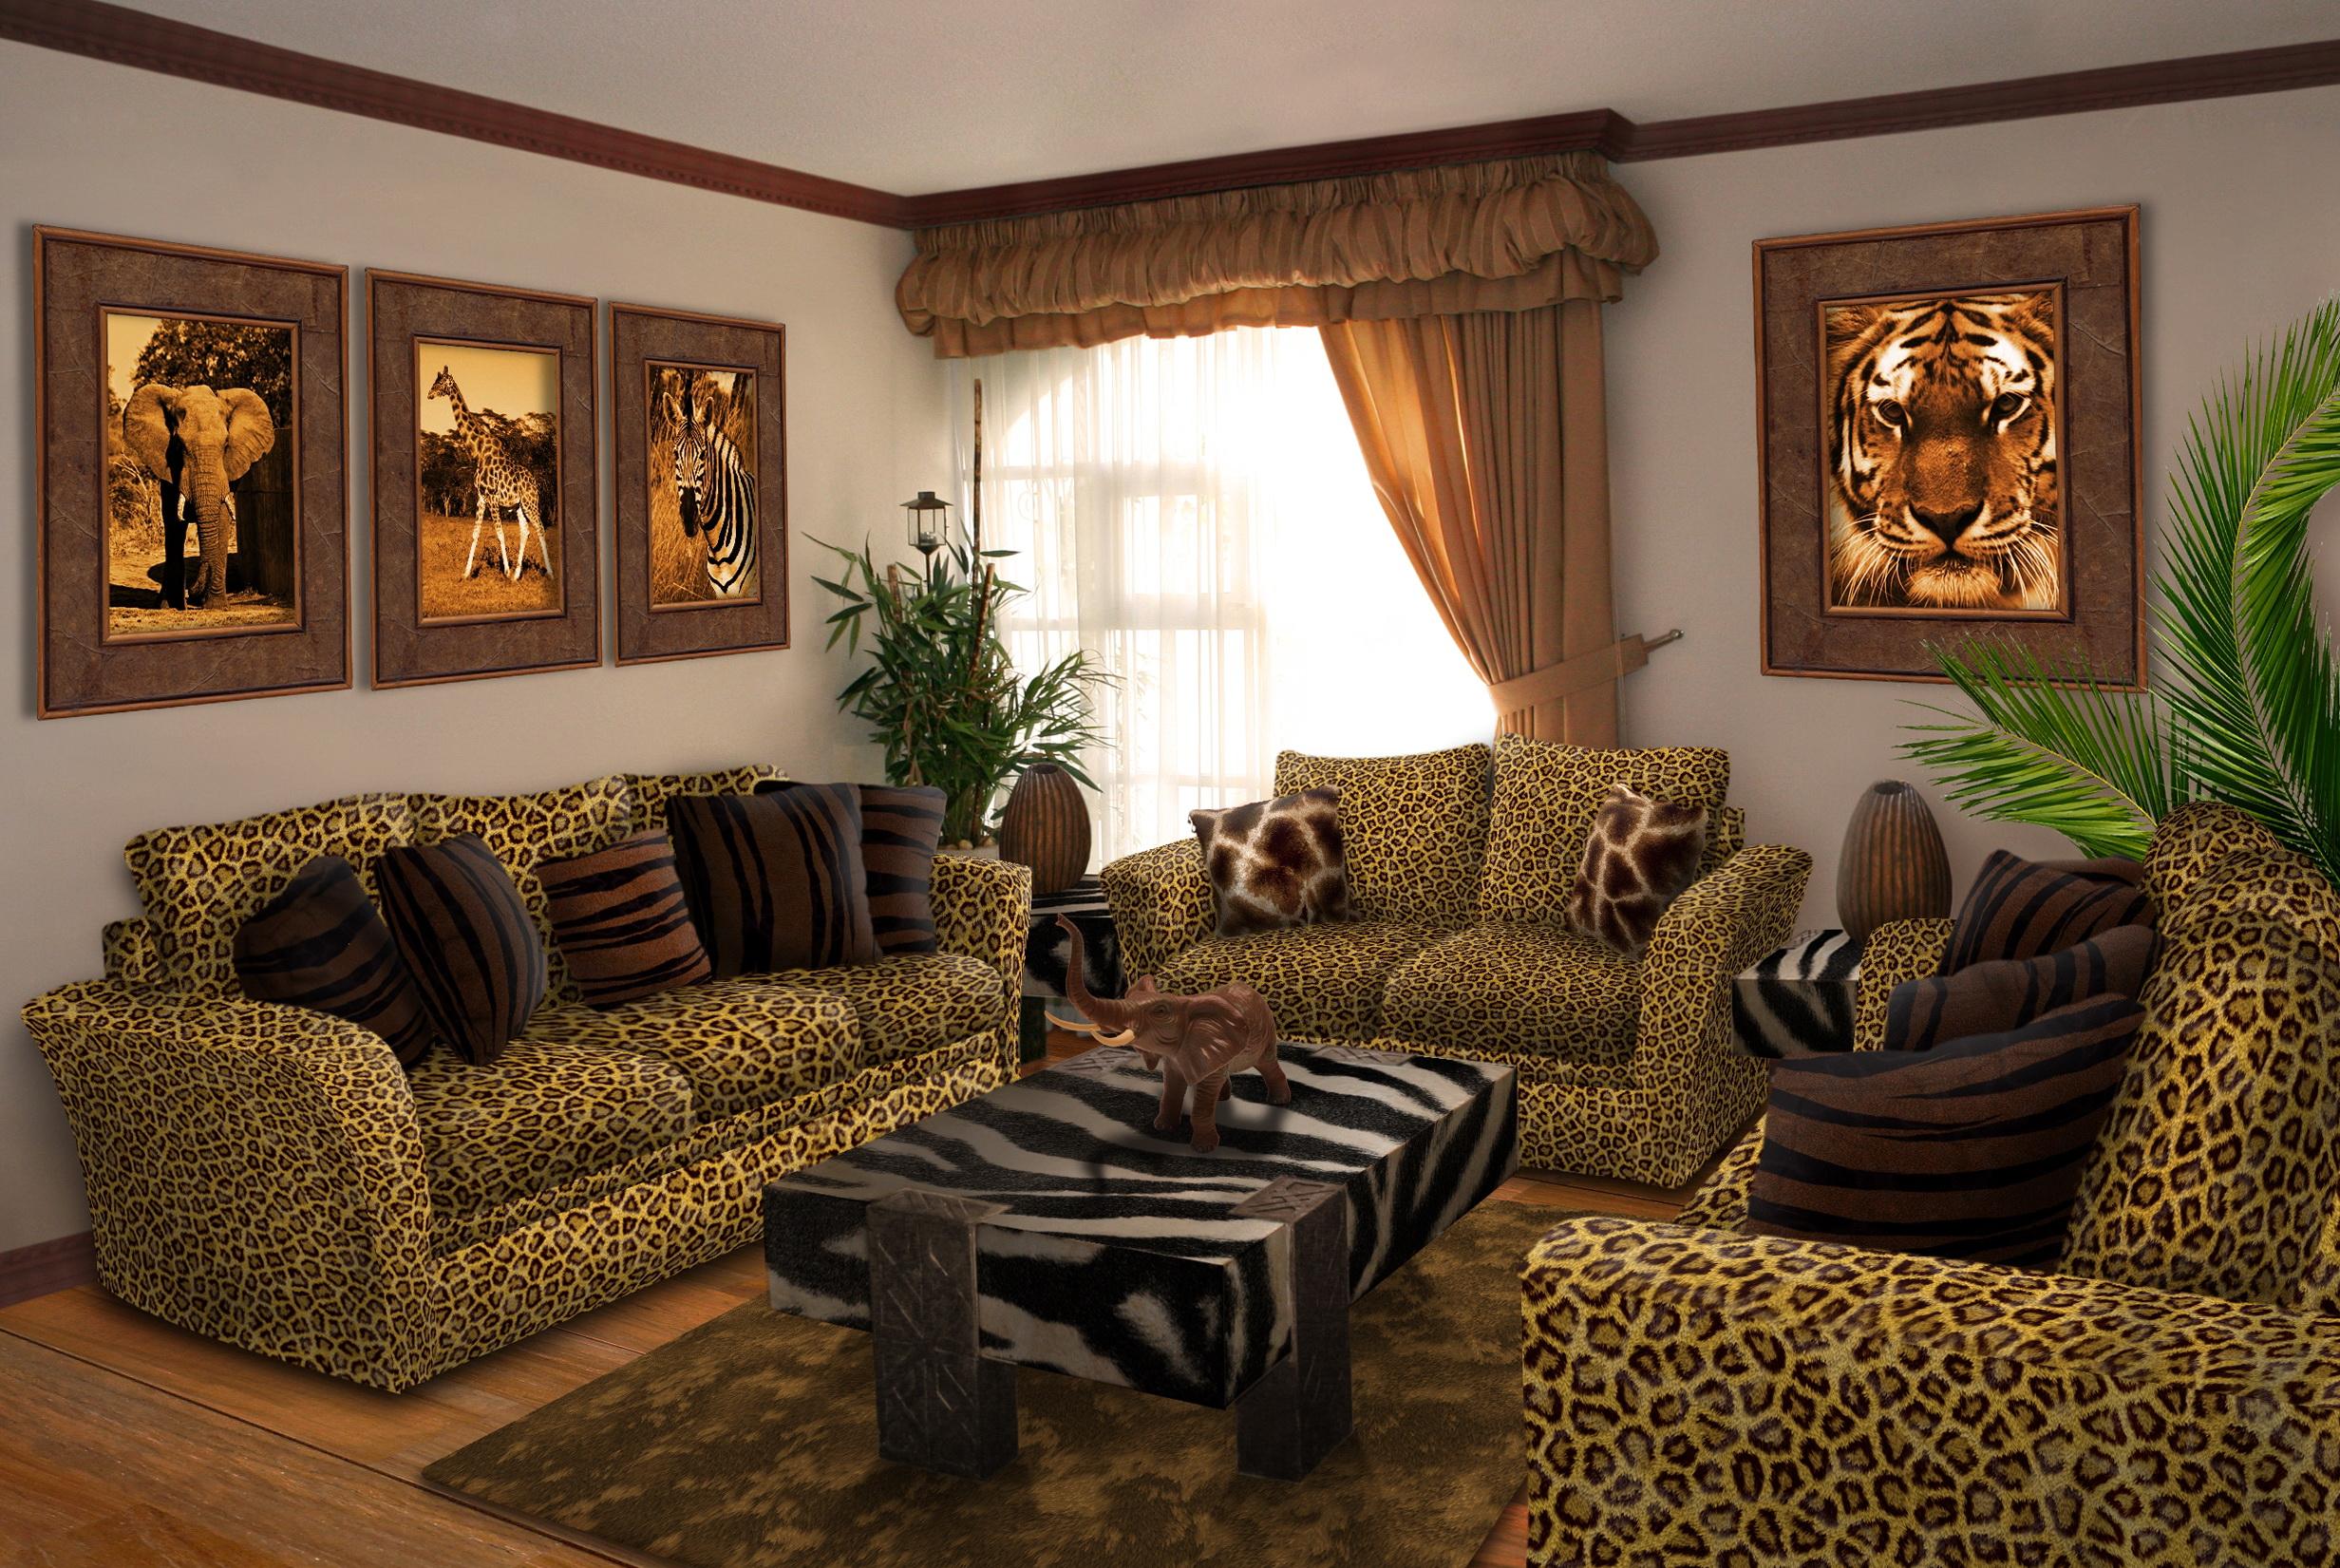 30 African Living Room Ideas By Digital Interiors Digital Interiors